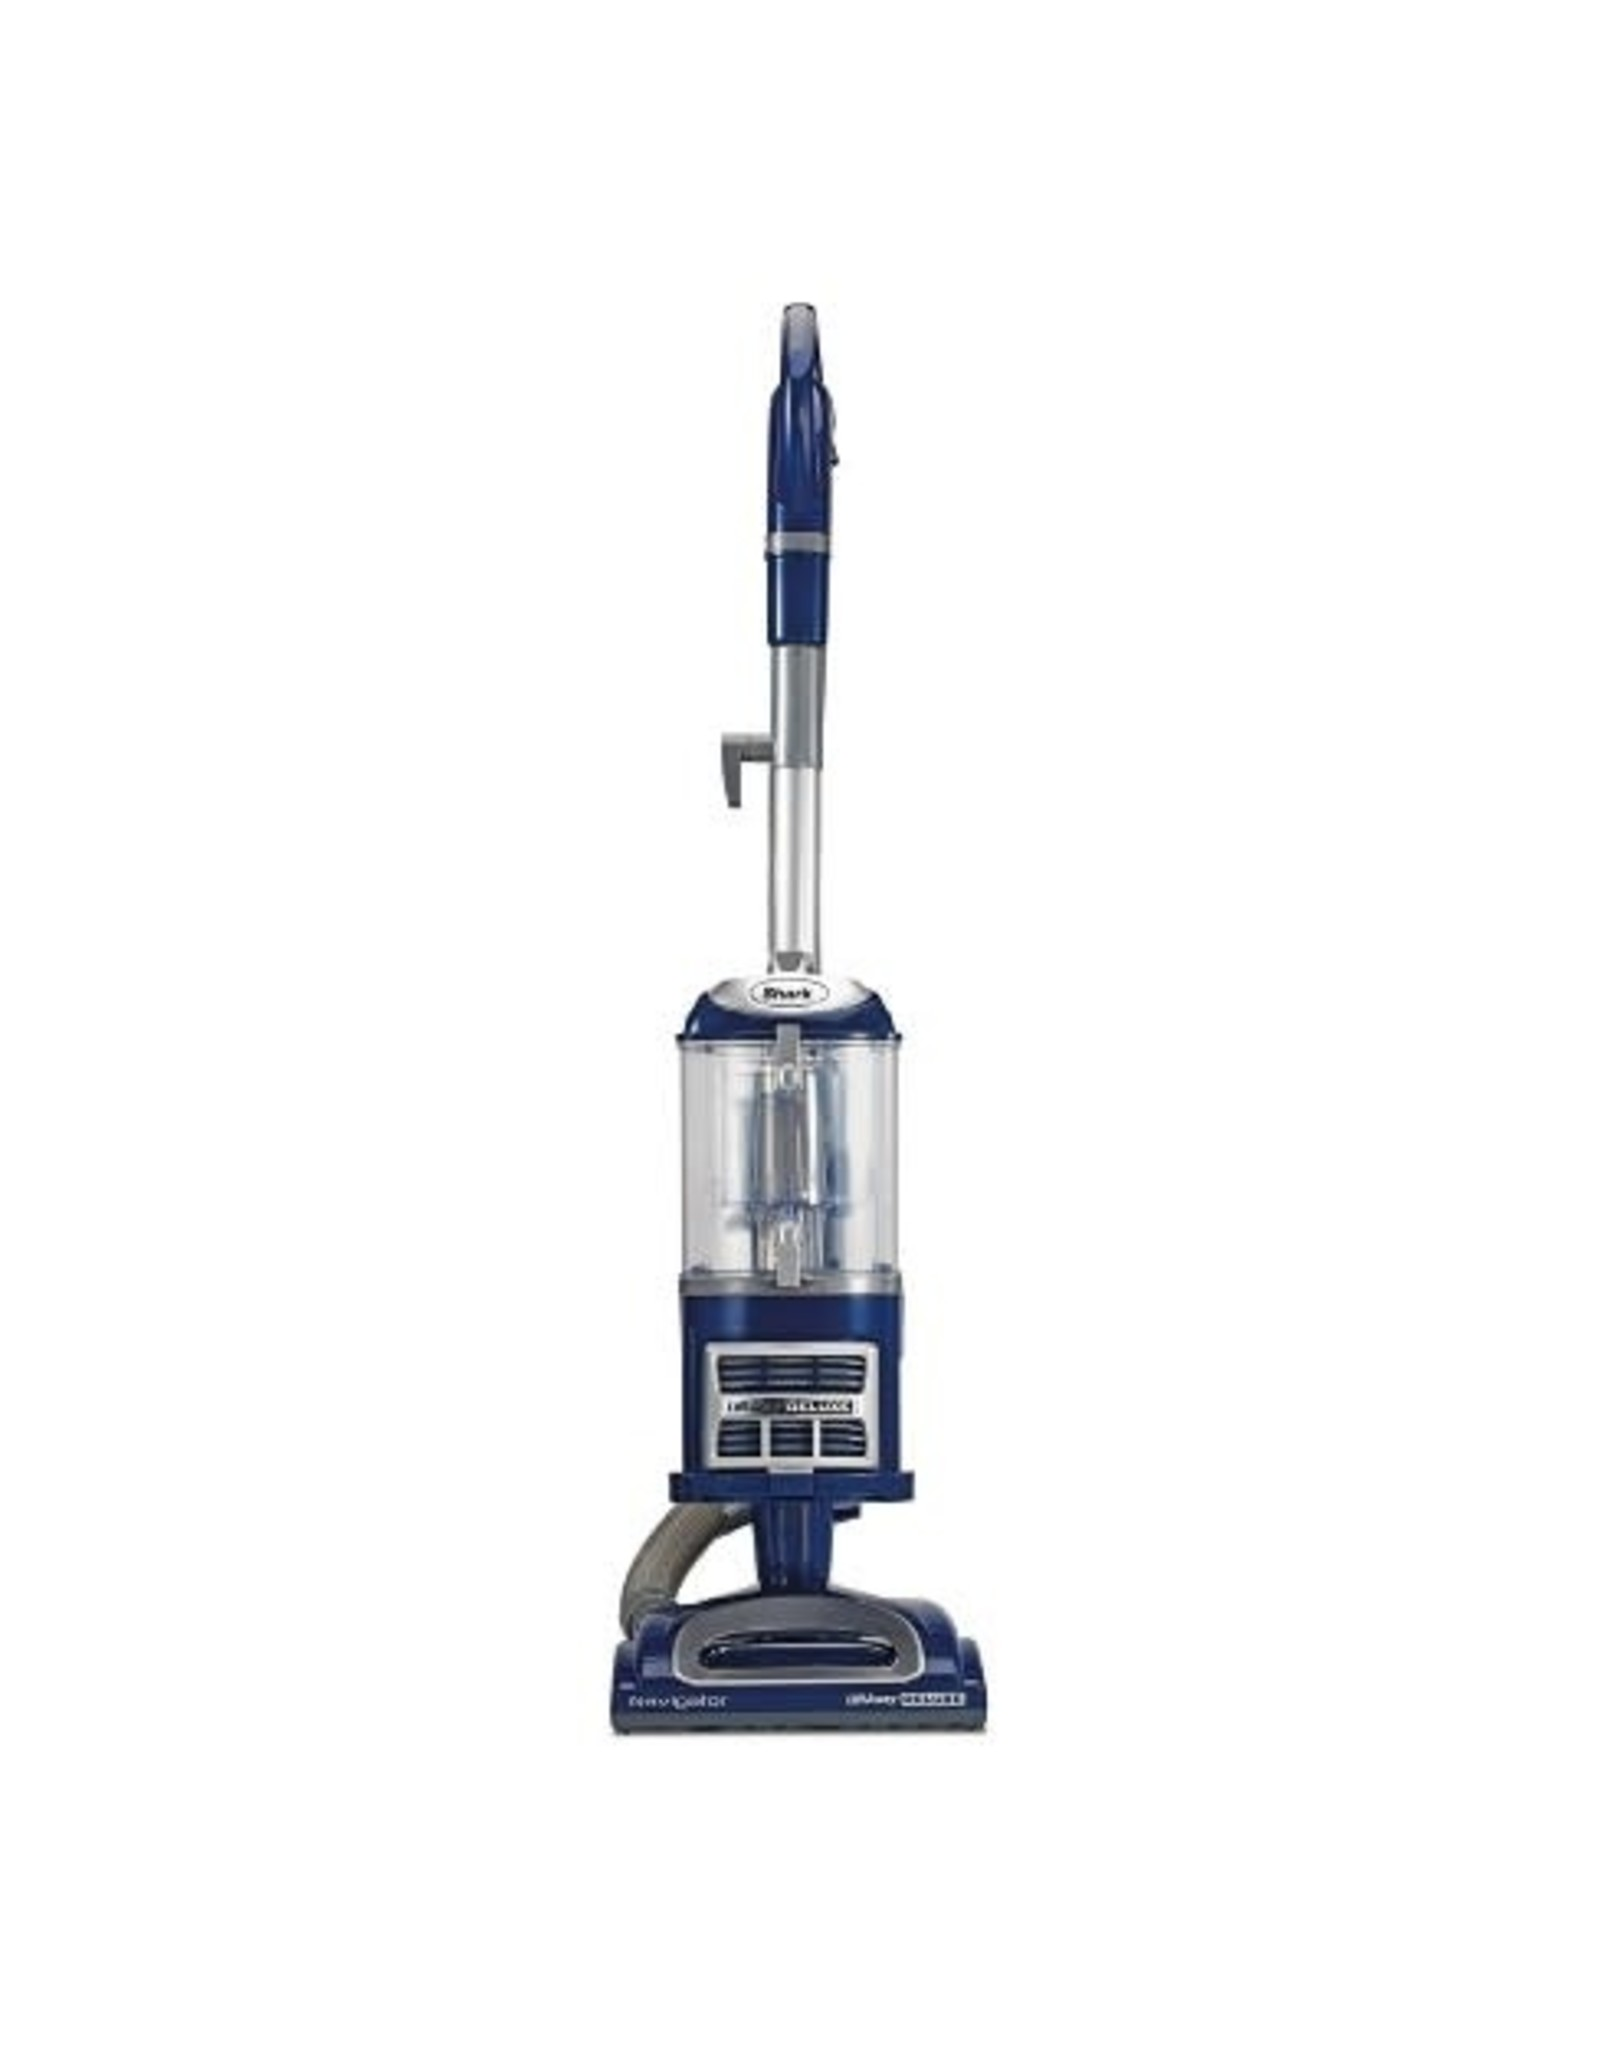 SHARK NV360 SharkNinja - Navigator Lift-Away Deluxe NV360 Upright Vacuum Cleaner - Blue